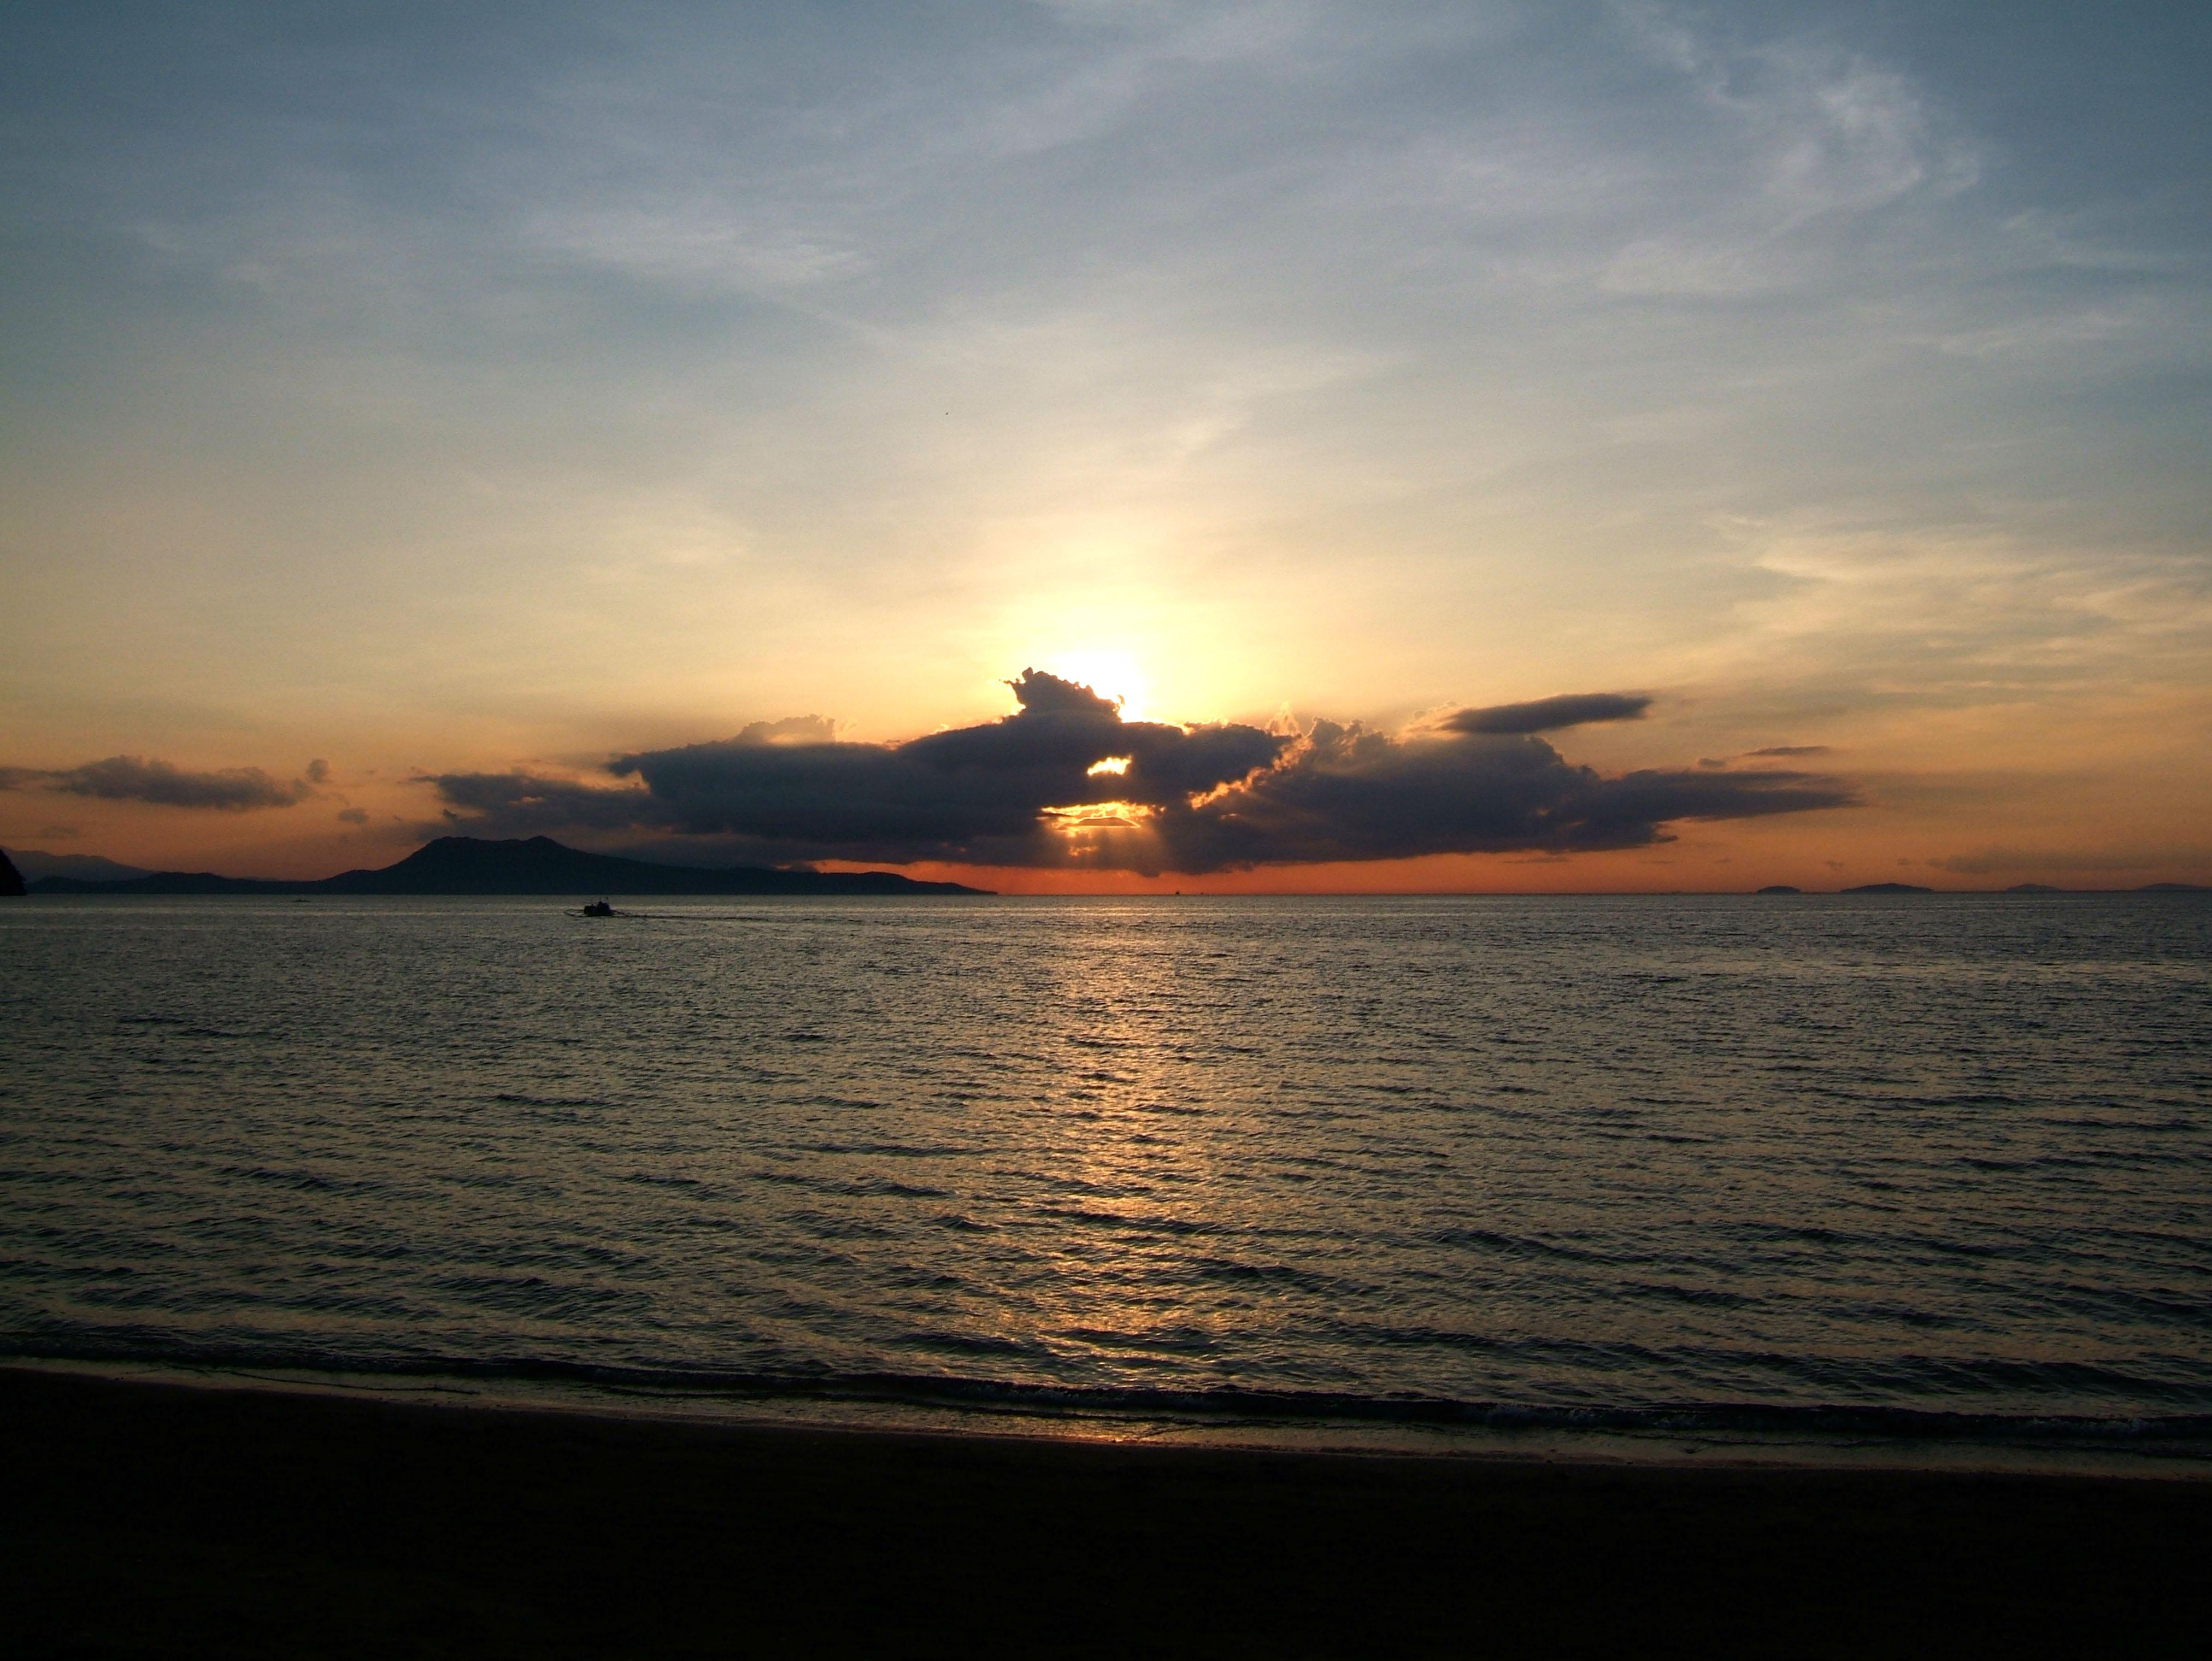 Sunrise Philippines Mindoro Island Tabinay 17